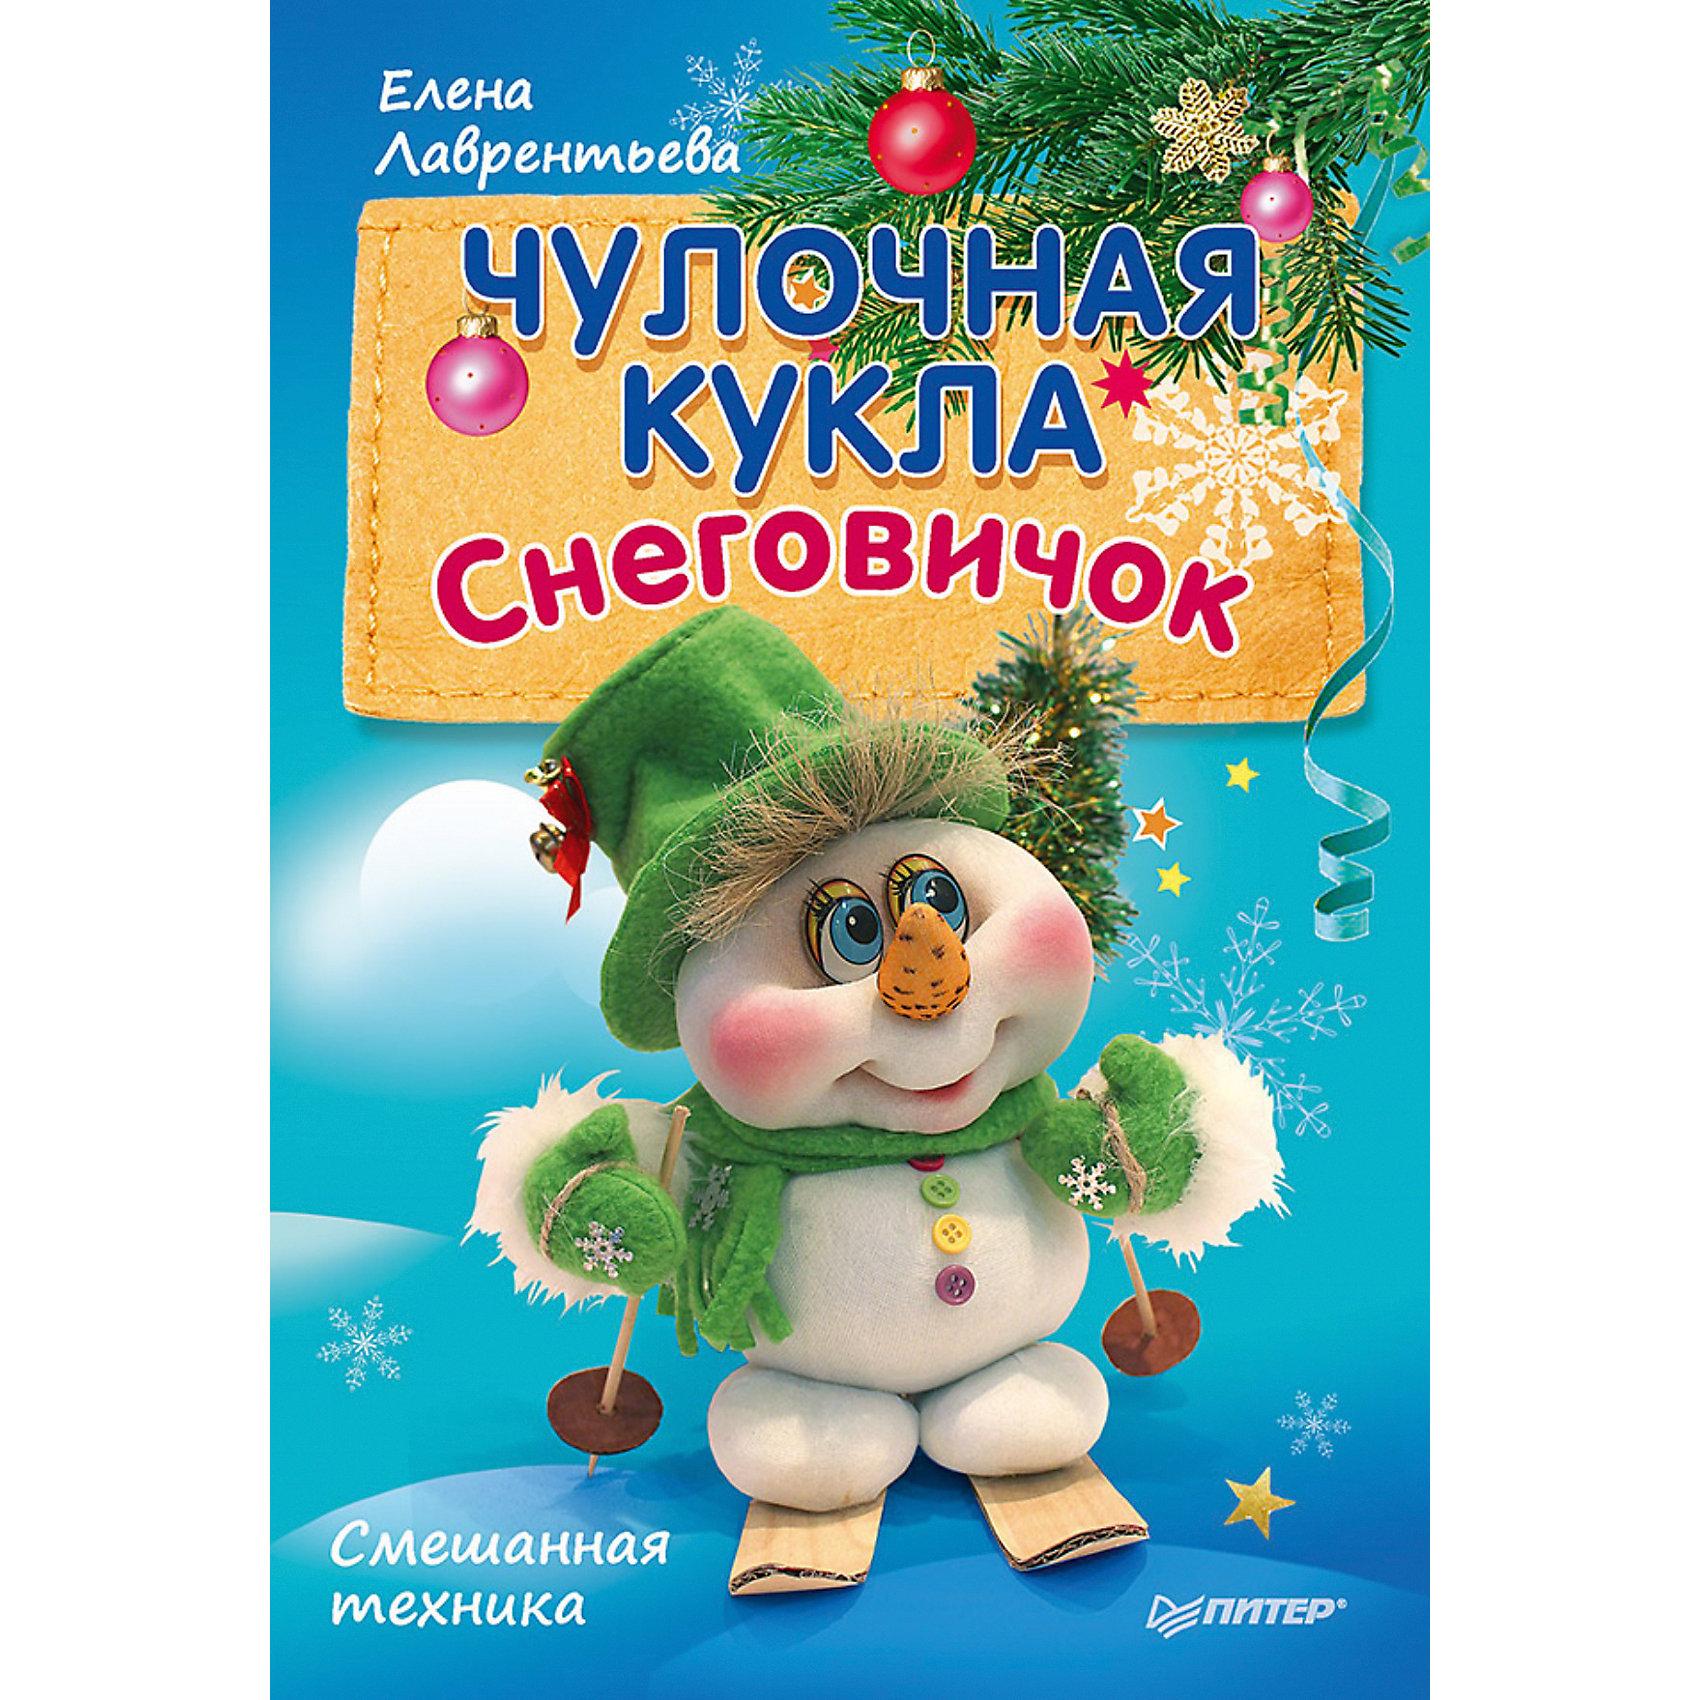 ПИТЕР Комплект из 2 книг Чулочная кукла: снеговичок и украшение на елку